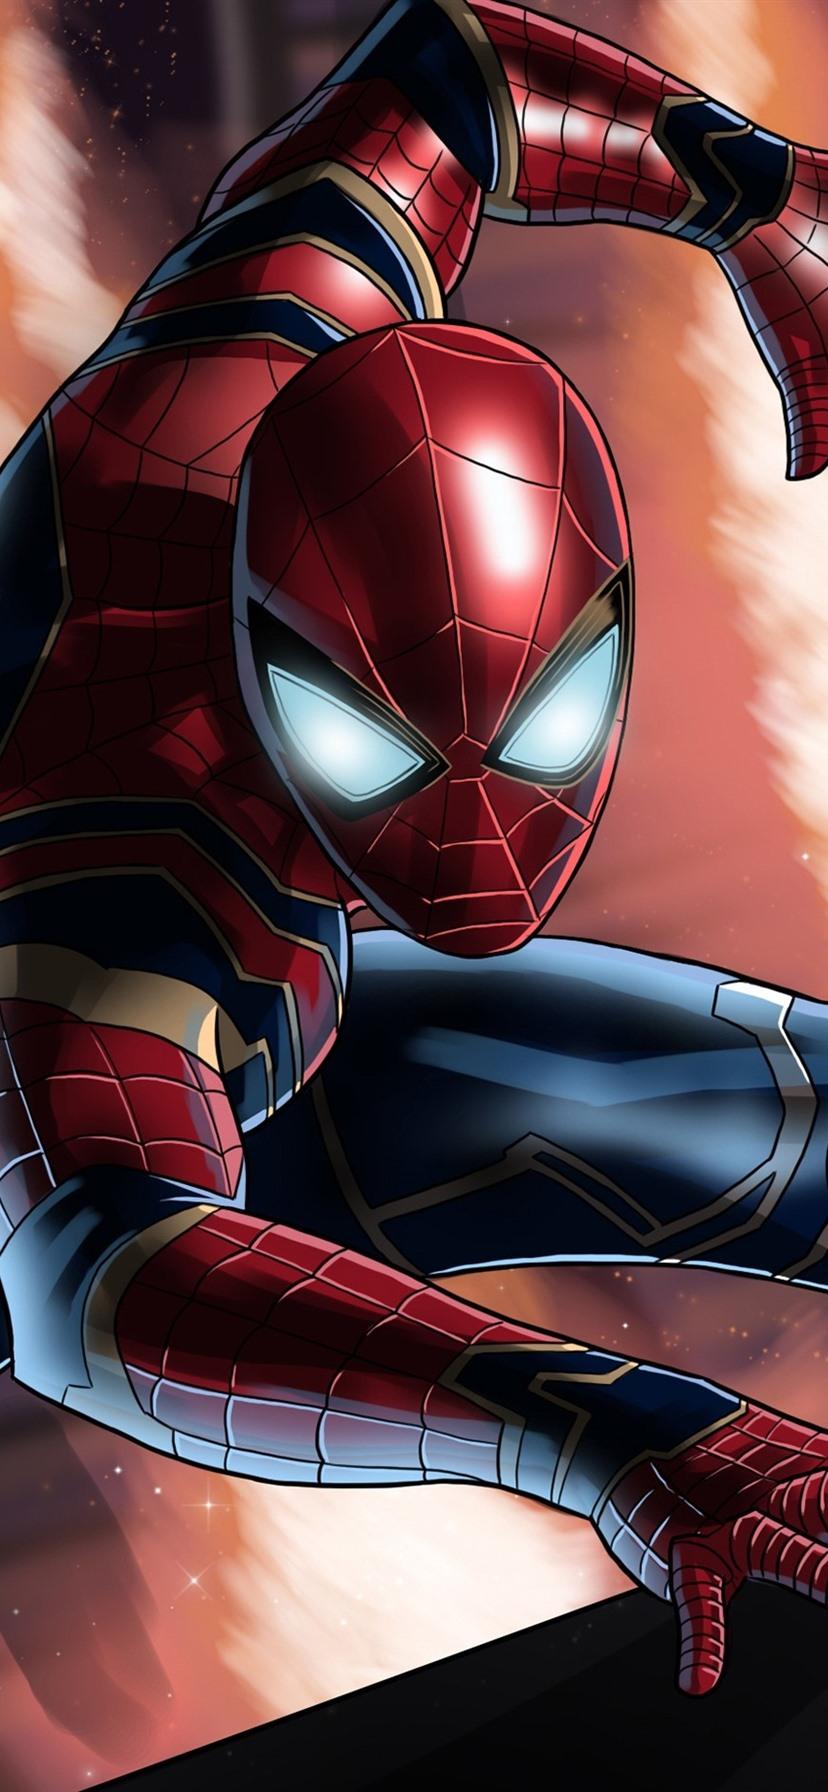 Spider Man Dc Comic Superhero 828x1792 Iphone Xr Wallpaper